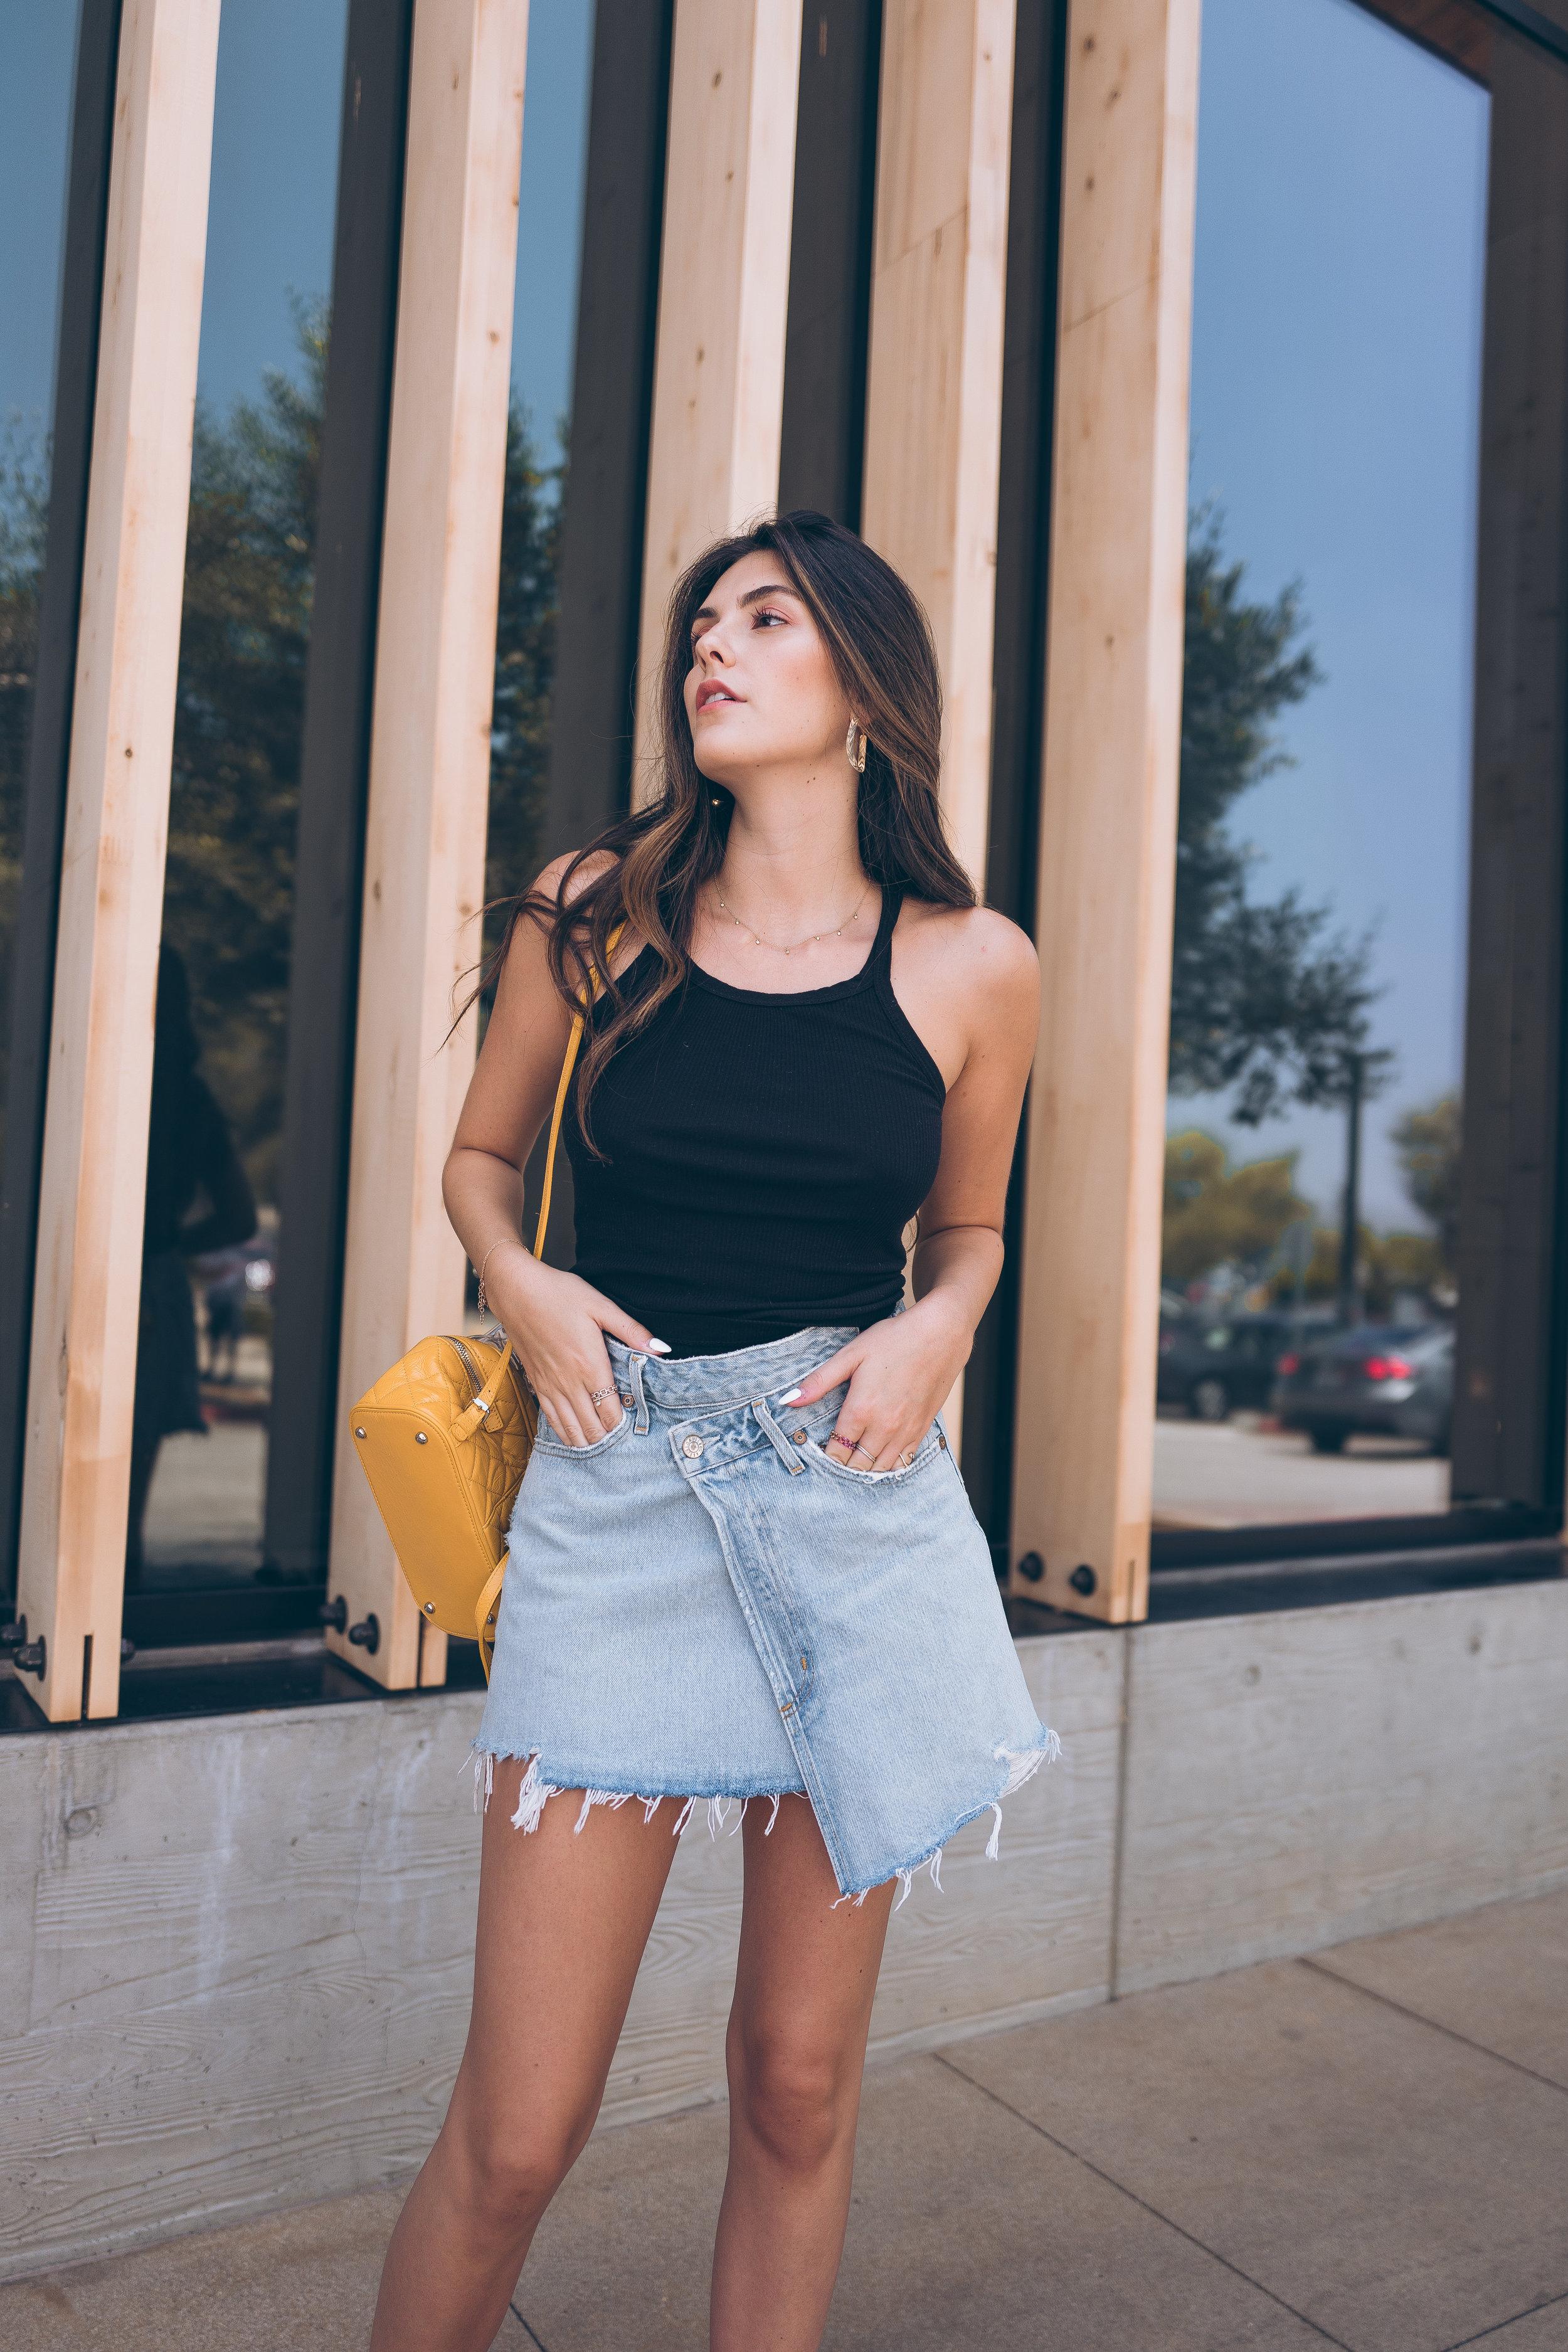 Everyday Summer Wardrobe Basics Julia Friedman Summer Outfit Inspo AGOLDE Skirt Jean Skirt Yellow Chanel Backpack  Beach Waves Summer Hair